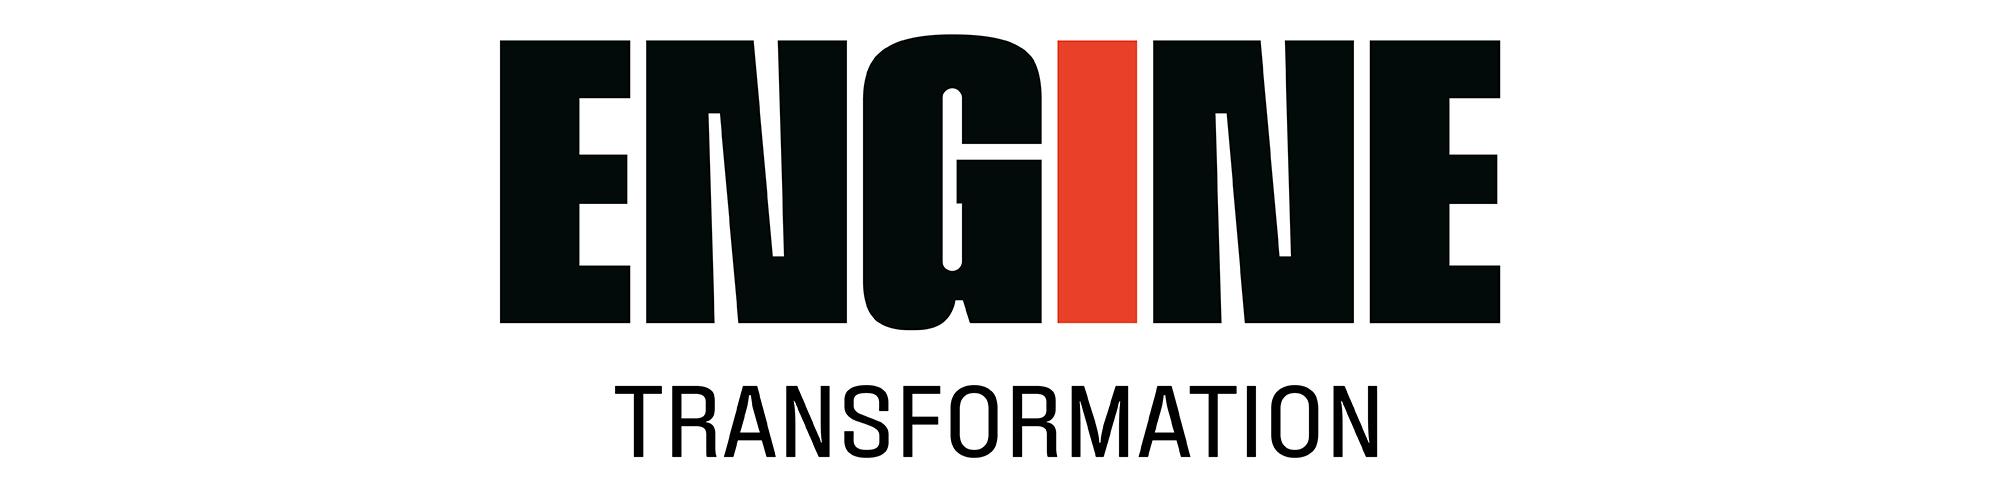 Engine Transformation Company Logo